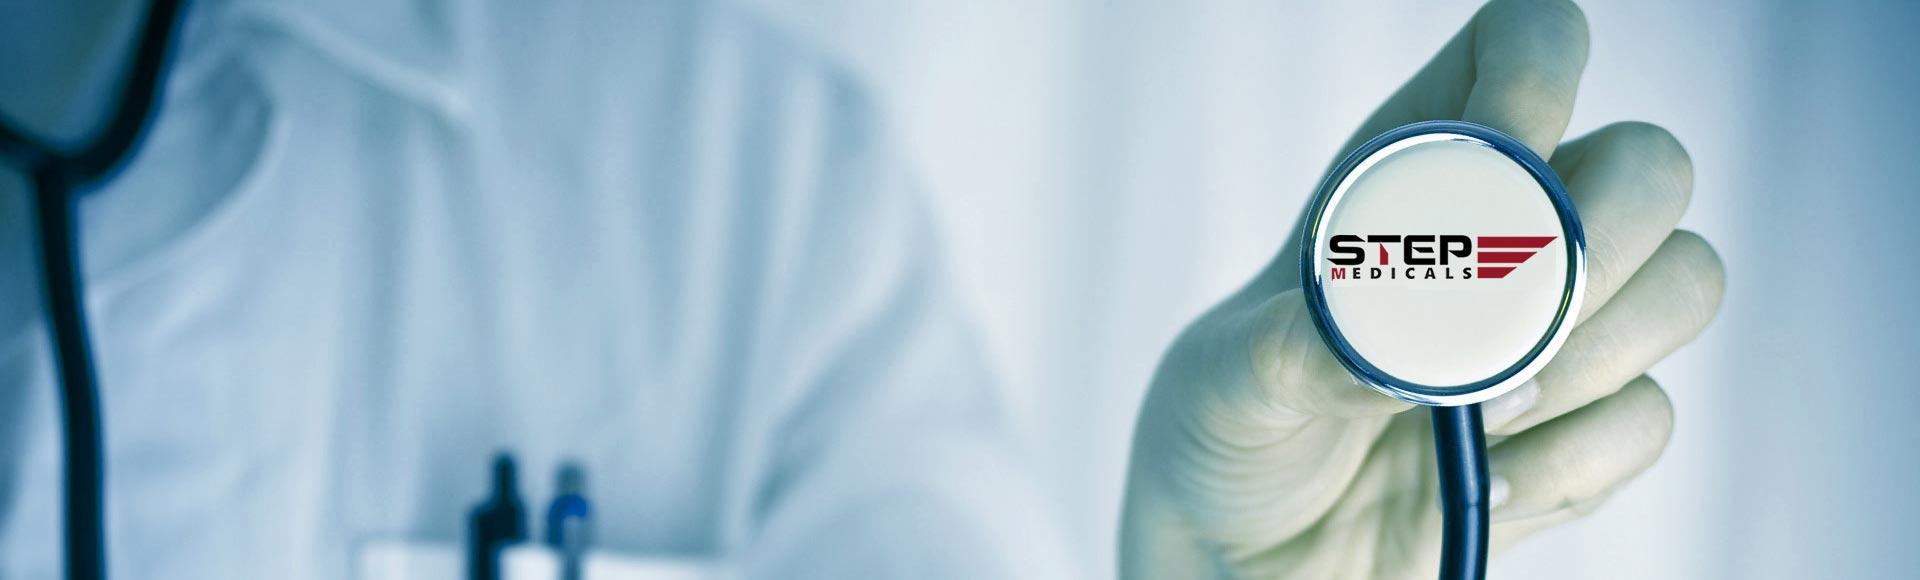 Stepmedicals -  международный медицинский центр